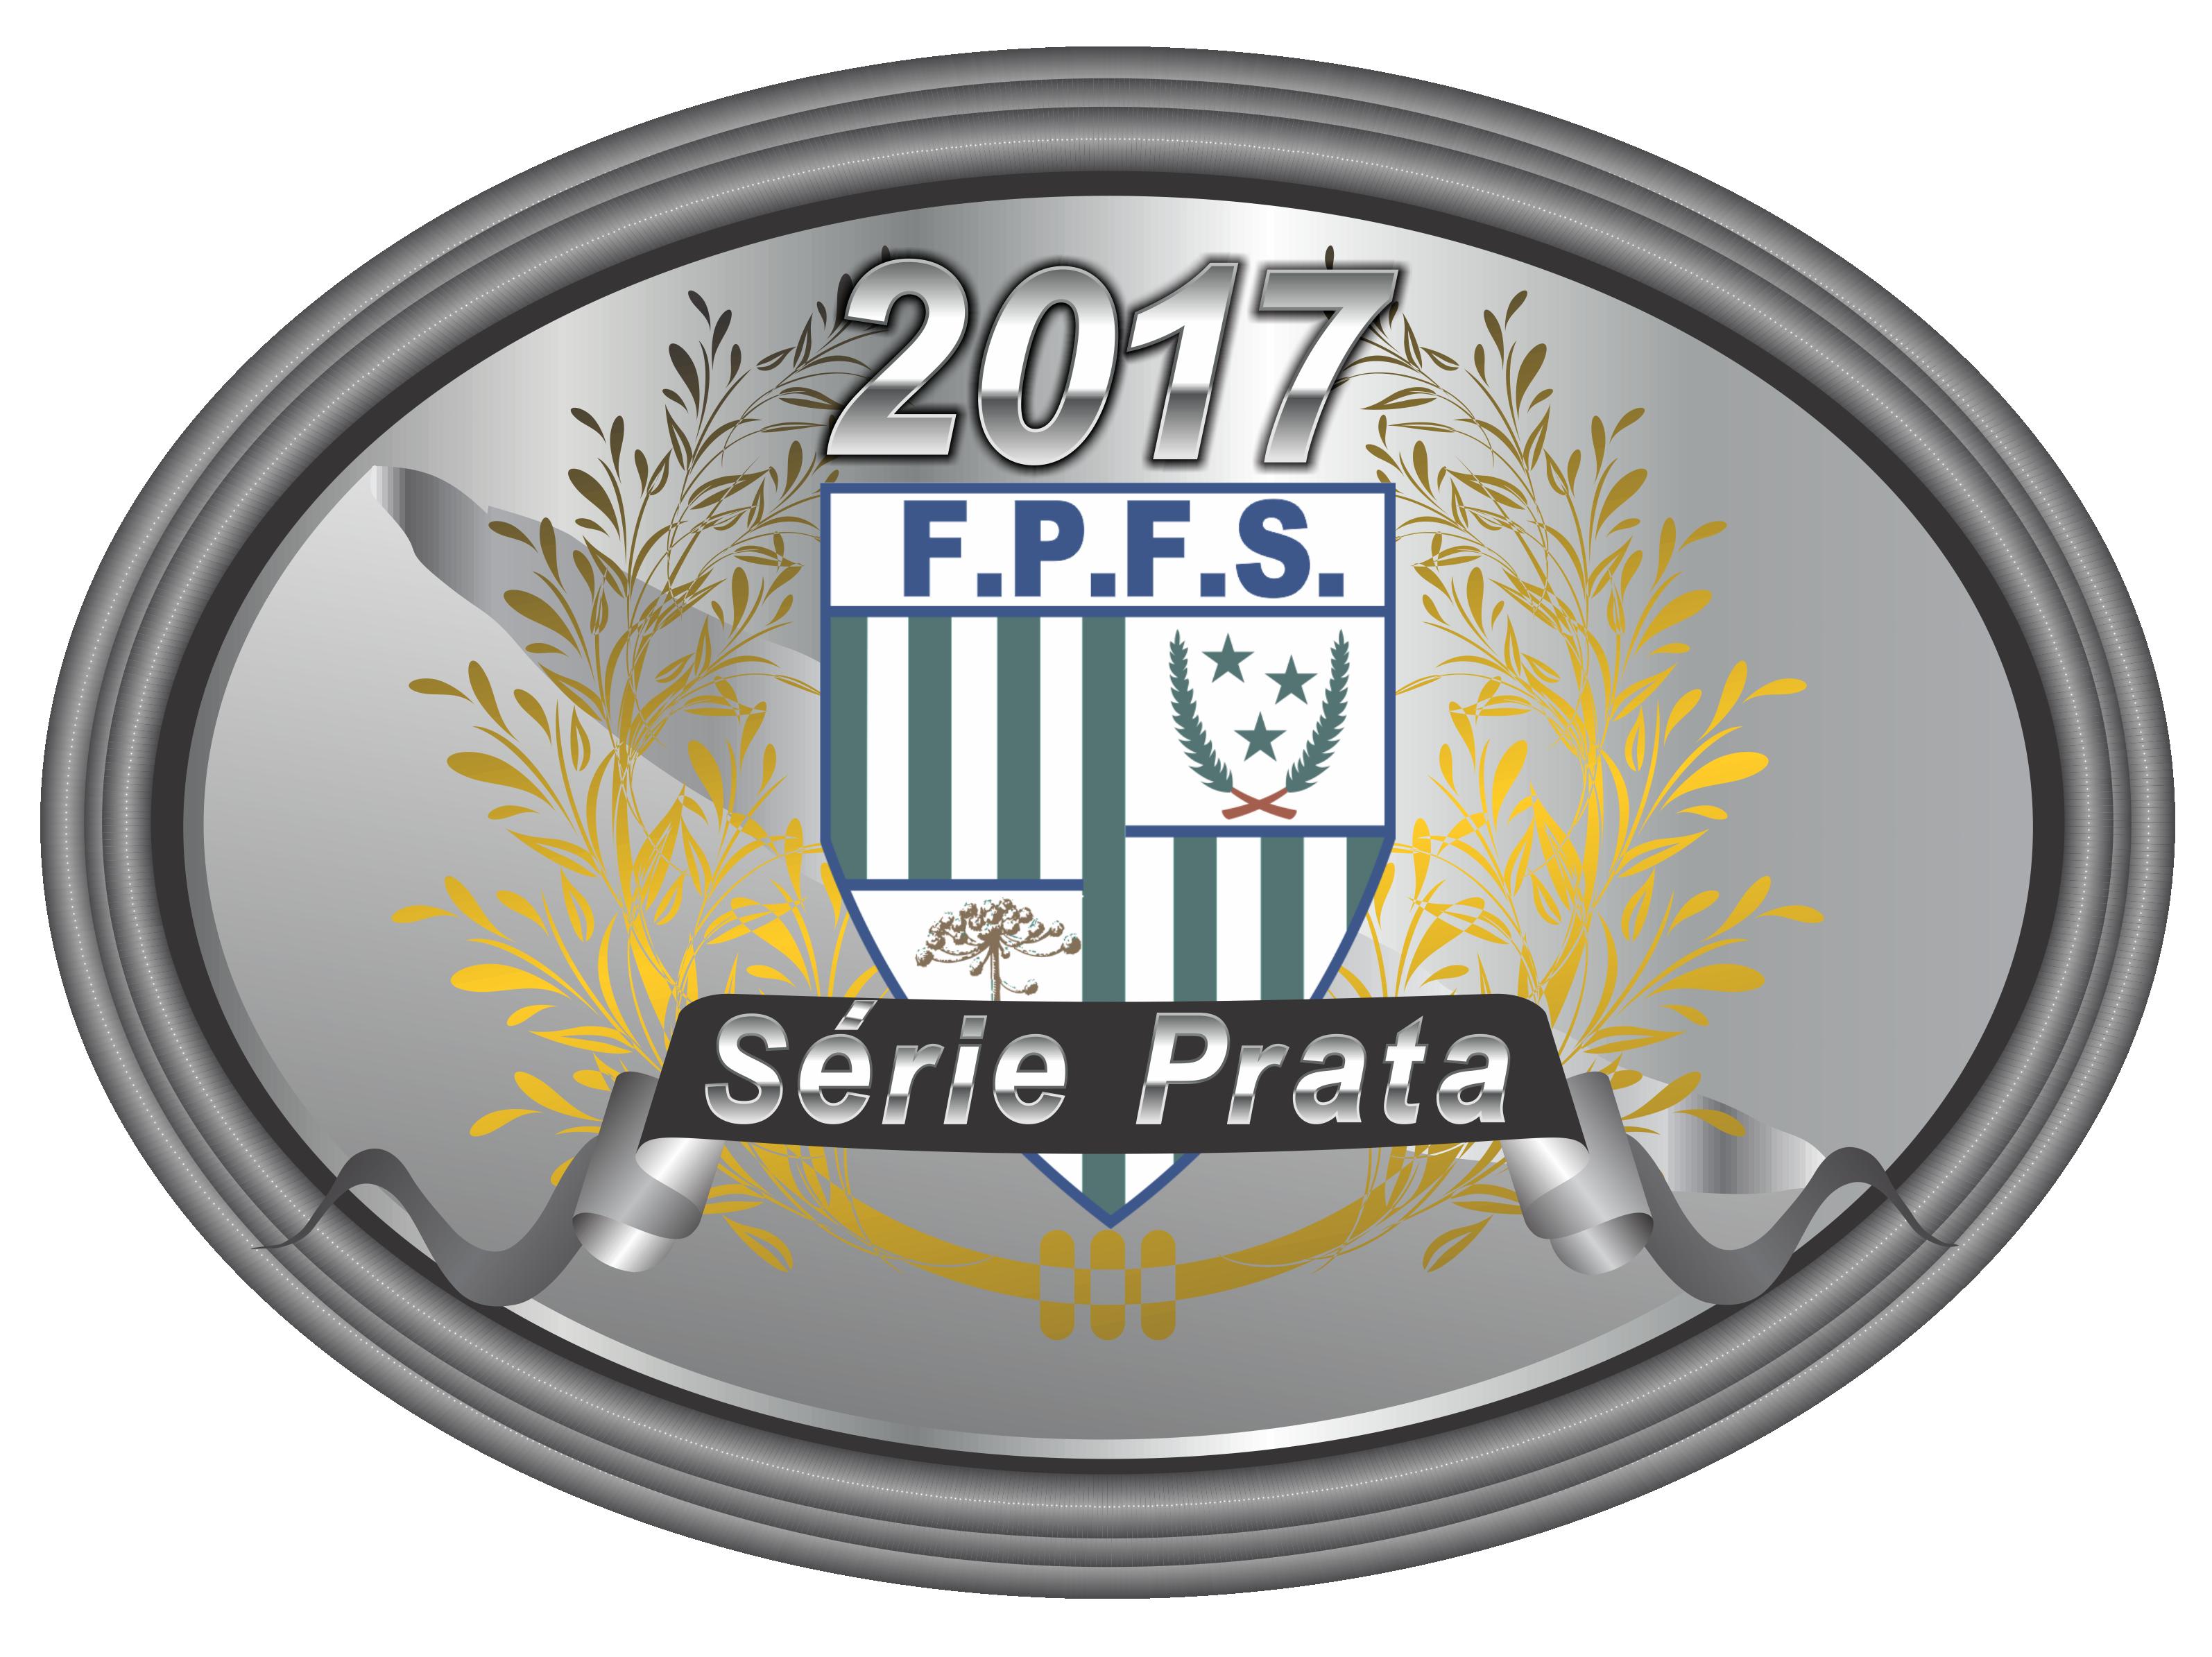 Série Prata-2017 4ª Fase